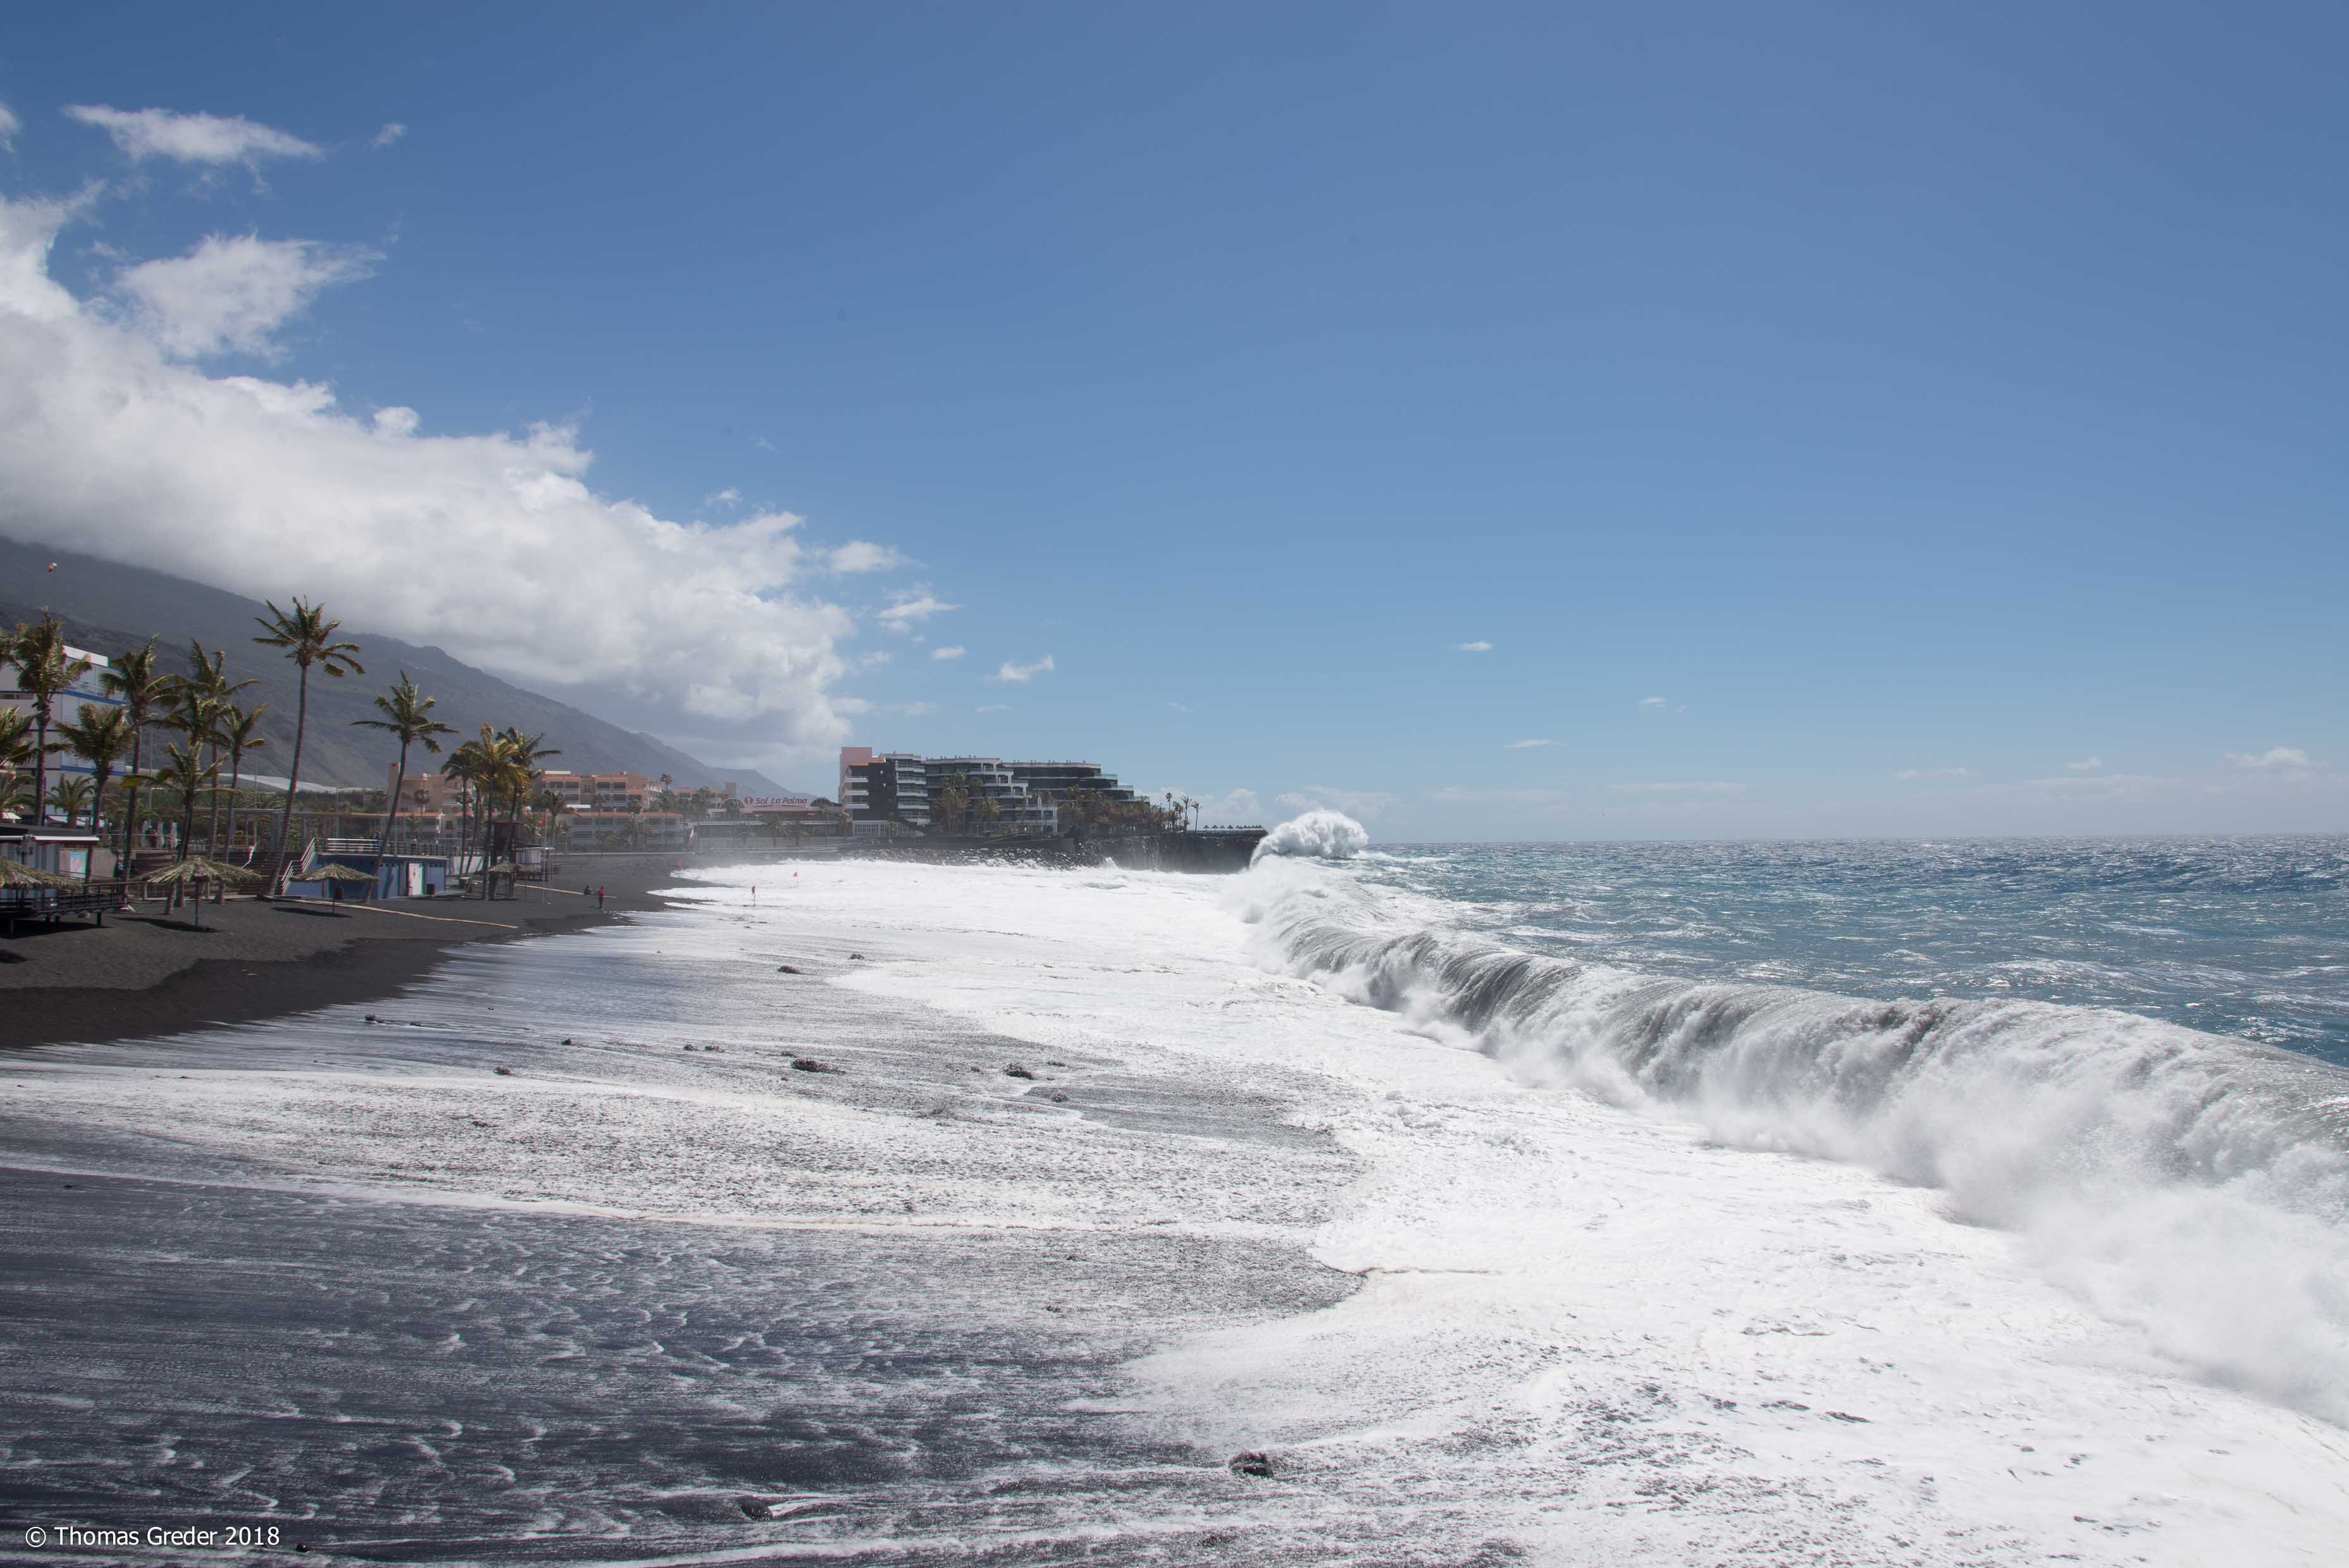 Wellen am Strand von Puerto de Naos